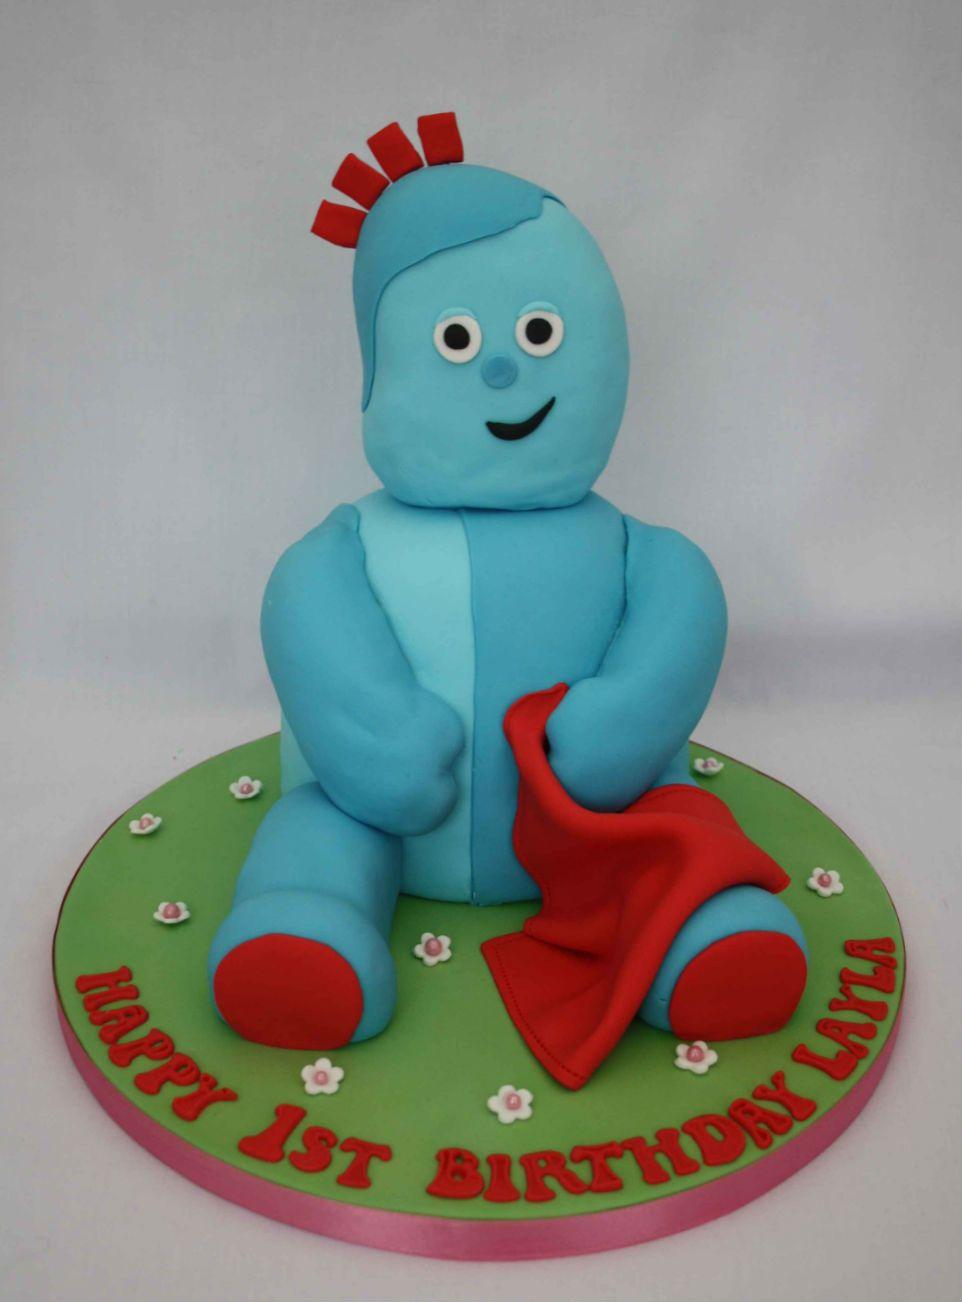 3D iggle piggle | Cake of the Week #9 - Character Cake Theme ...